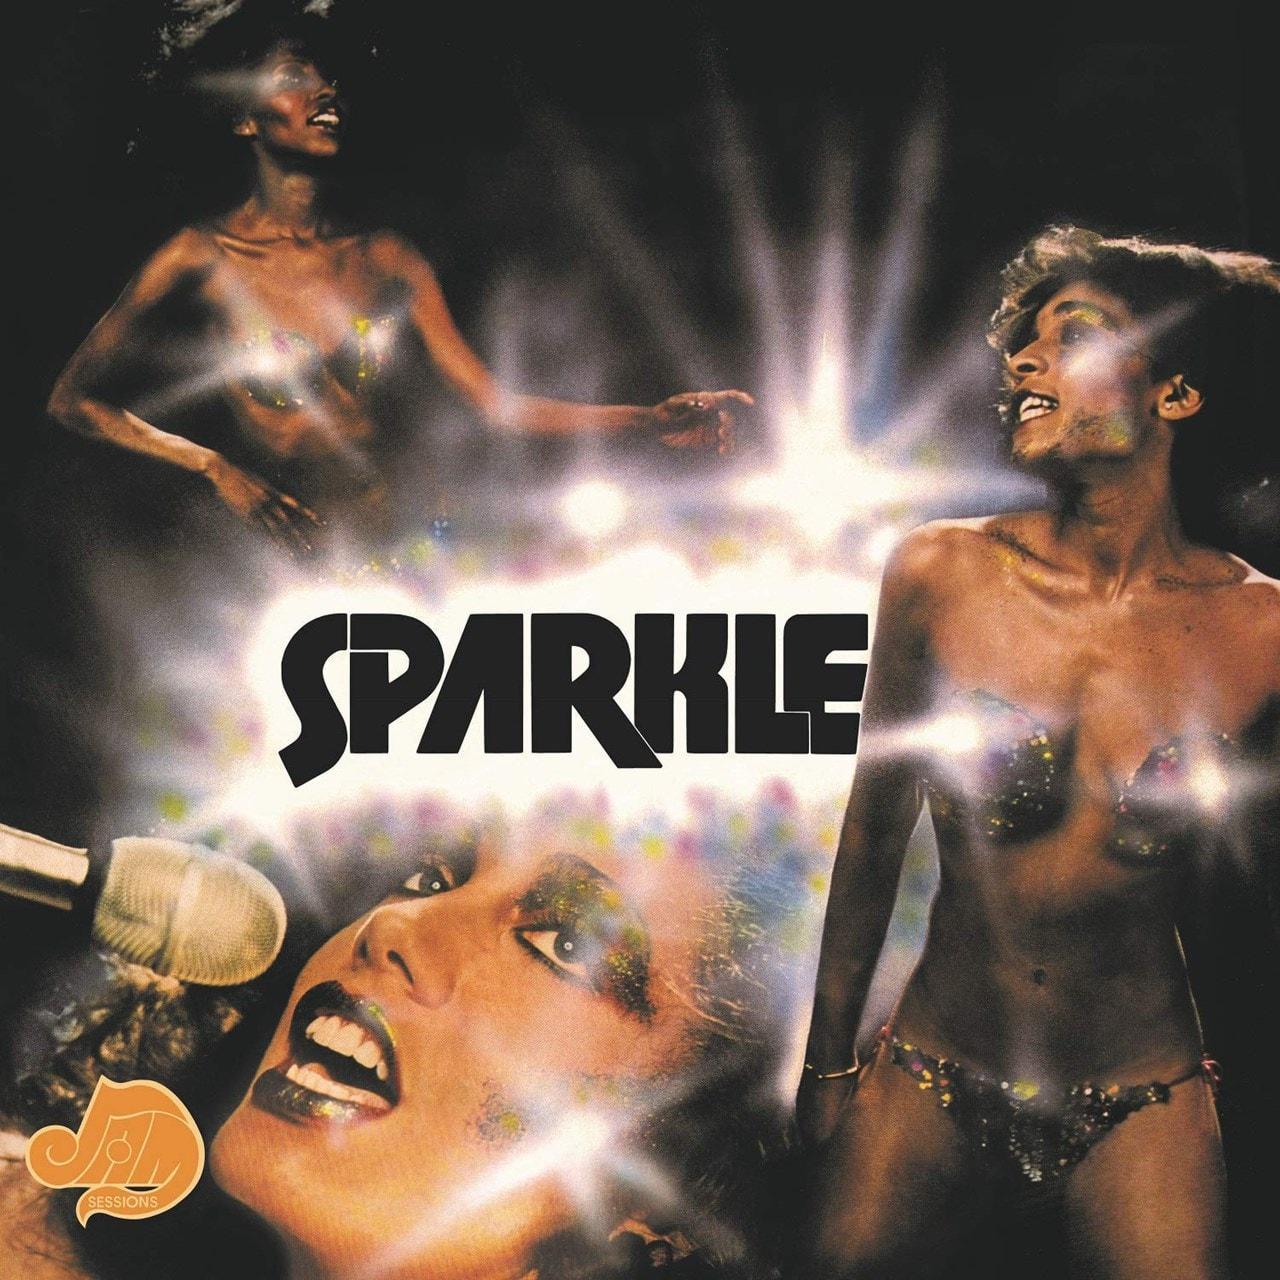 Sparkle - 1